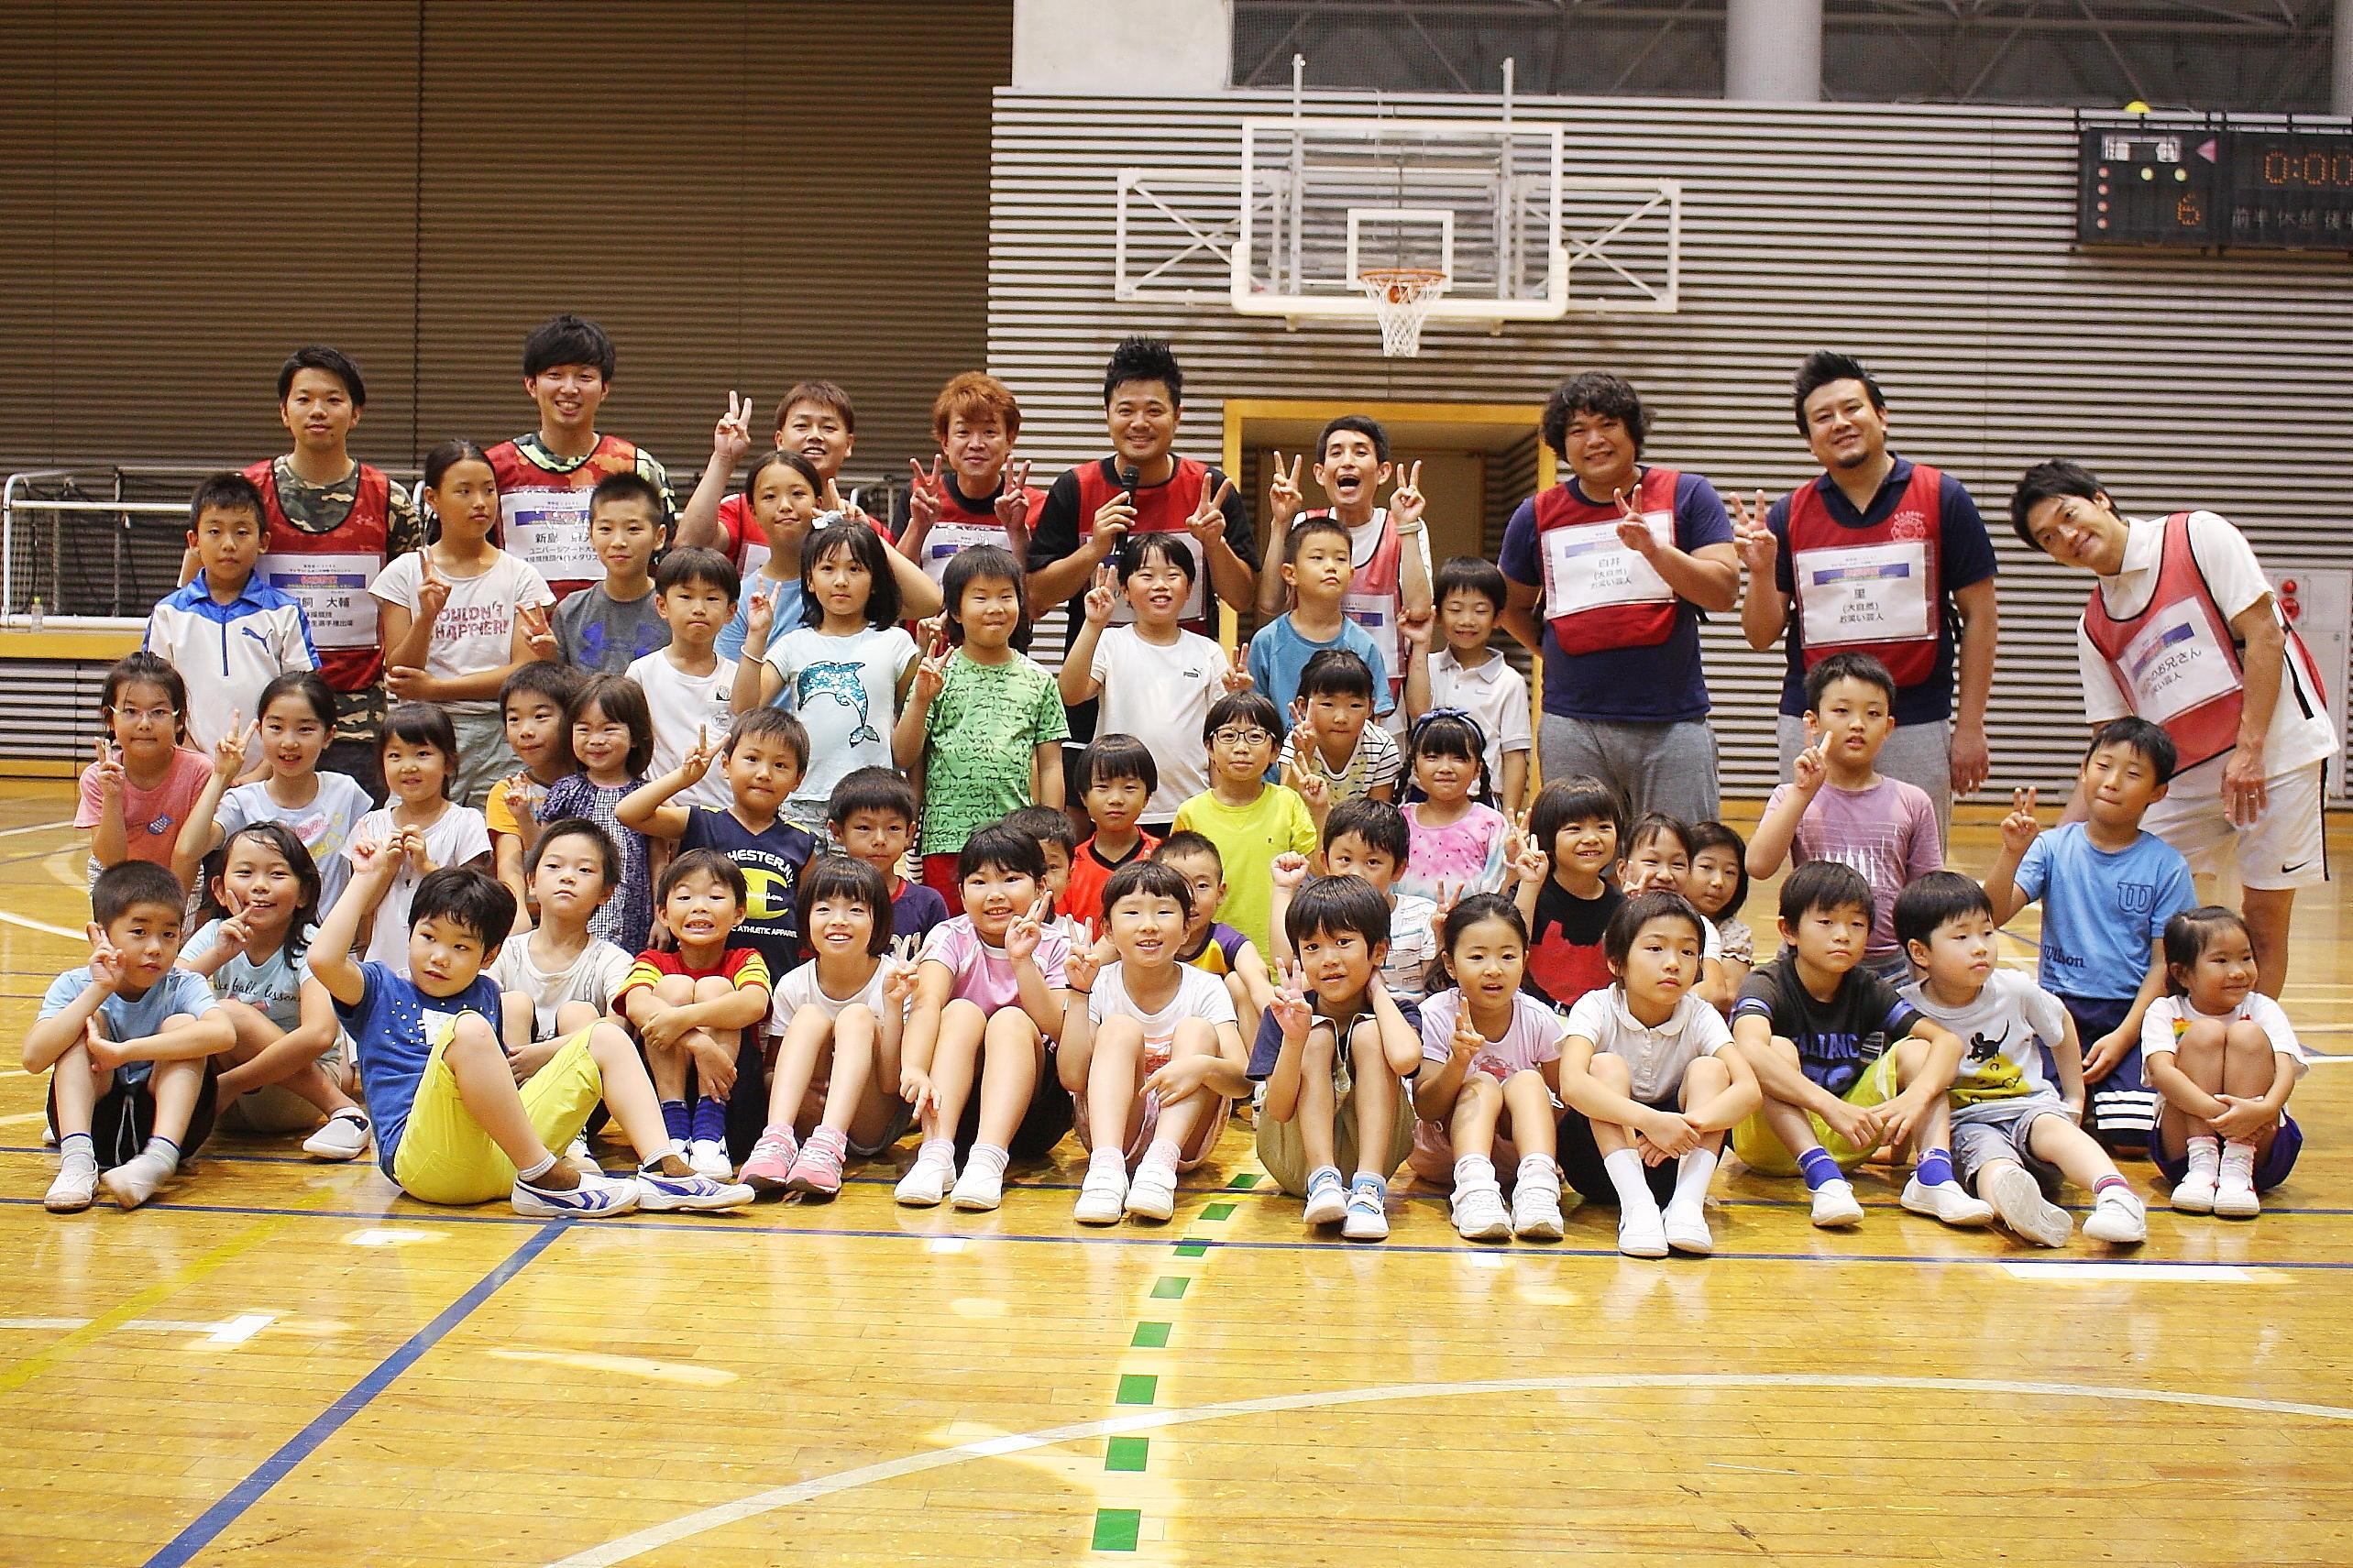 http://news.yoshimoto.co.jp/20180731114705-3856a5d874306e8d755fb1d669f427982c36e4e8.jpg